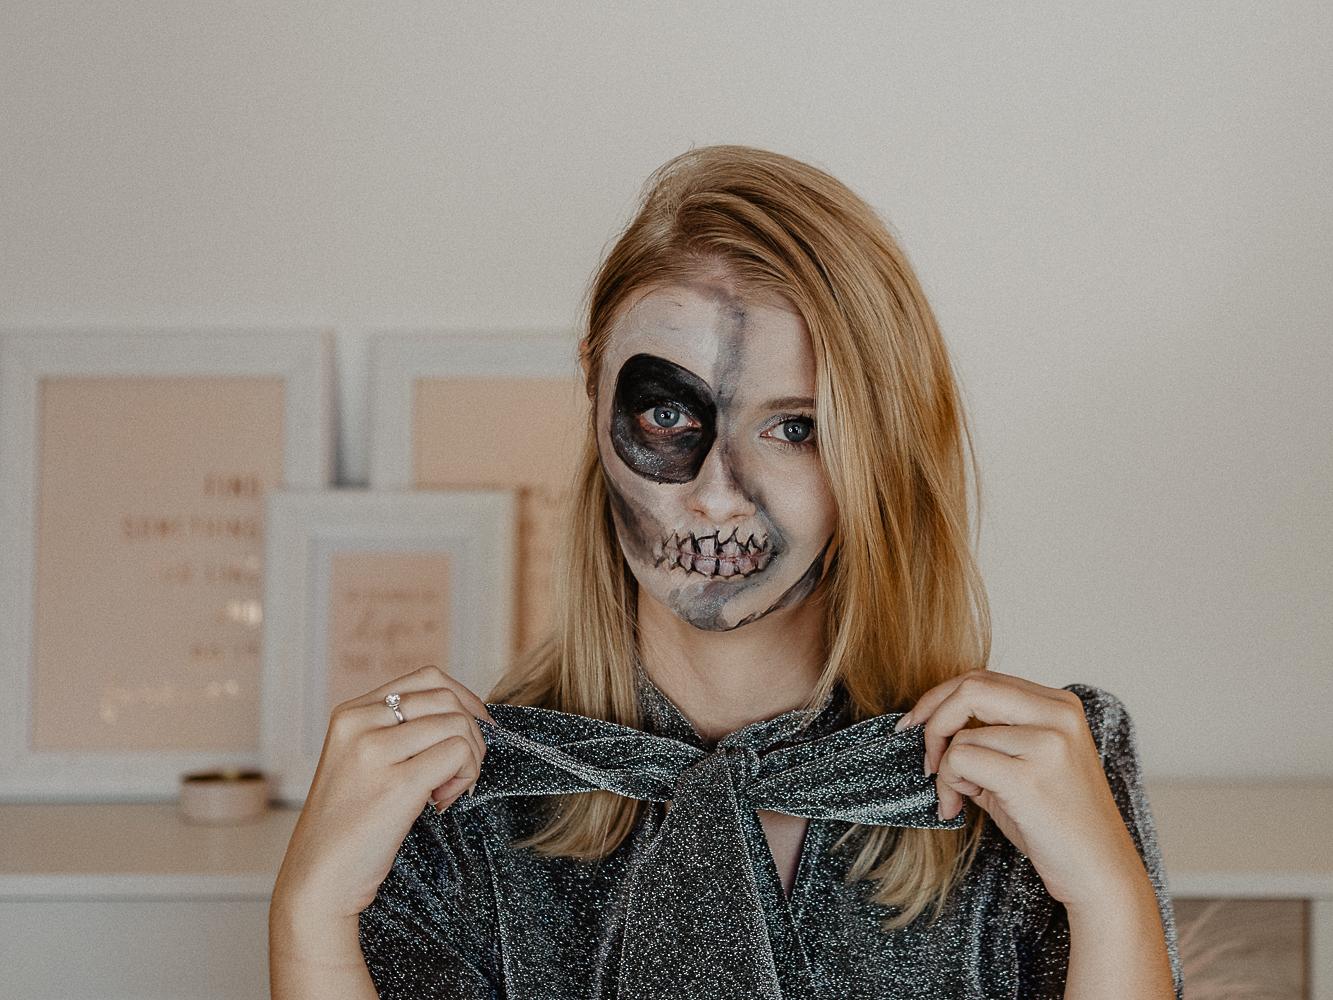 Halloween Schminke Deutsch.Half Skull Halloween Makup Tutorial Mit Drogerieprodukten Halloween Schminken Einfach Anleitung Deutsch Besassique Beautyblog Muenchen 3 Von 7 Be Sassique